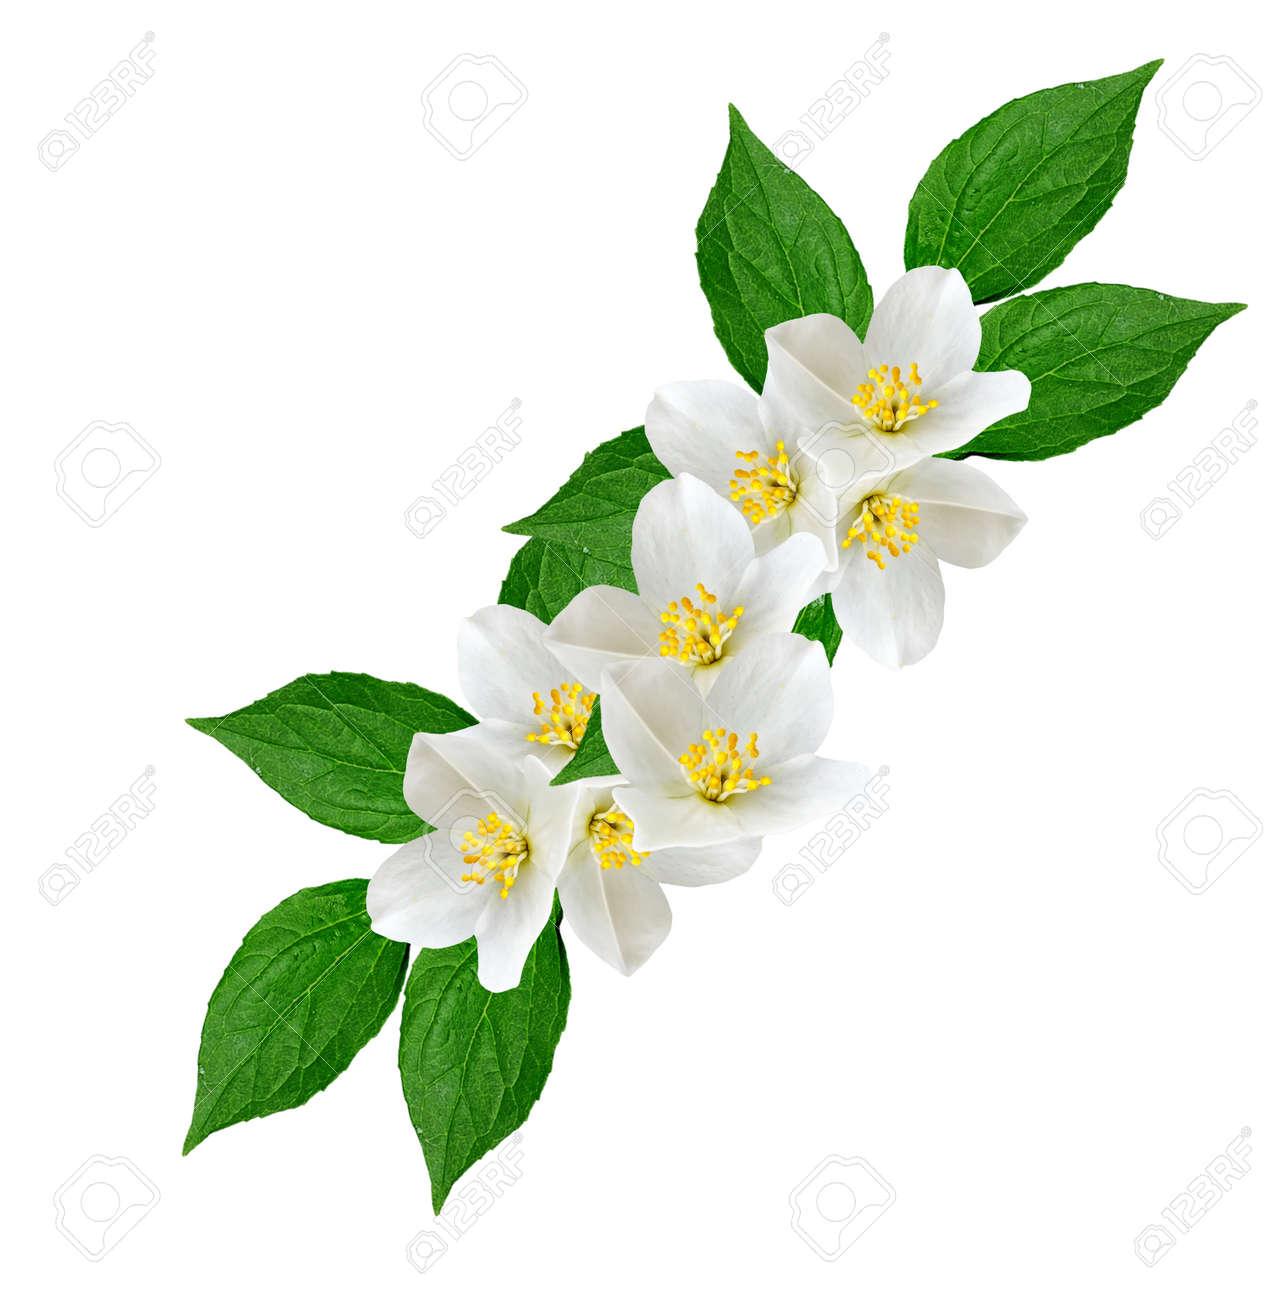 White jasmine flower branch of jasmine flowers isolated on stock stock photo white jasmine flower branch of jasmine flowers isolated on white background spring flowers izmirmasajfo Gallery